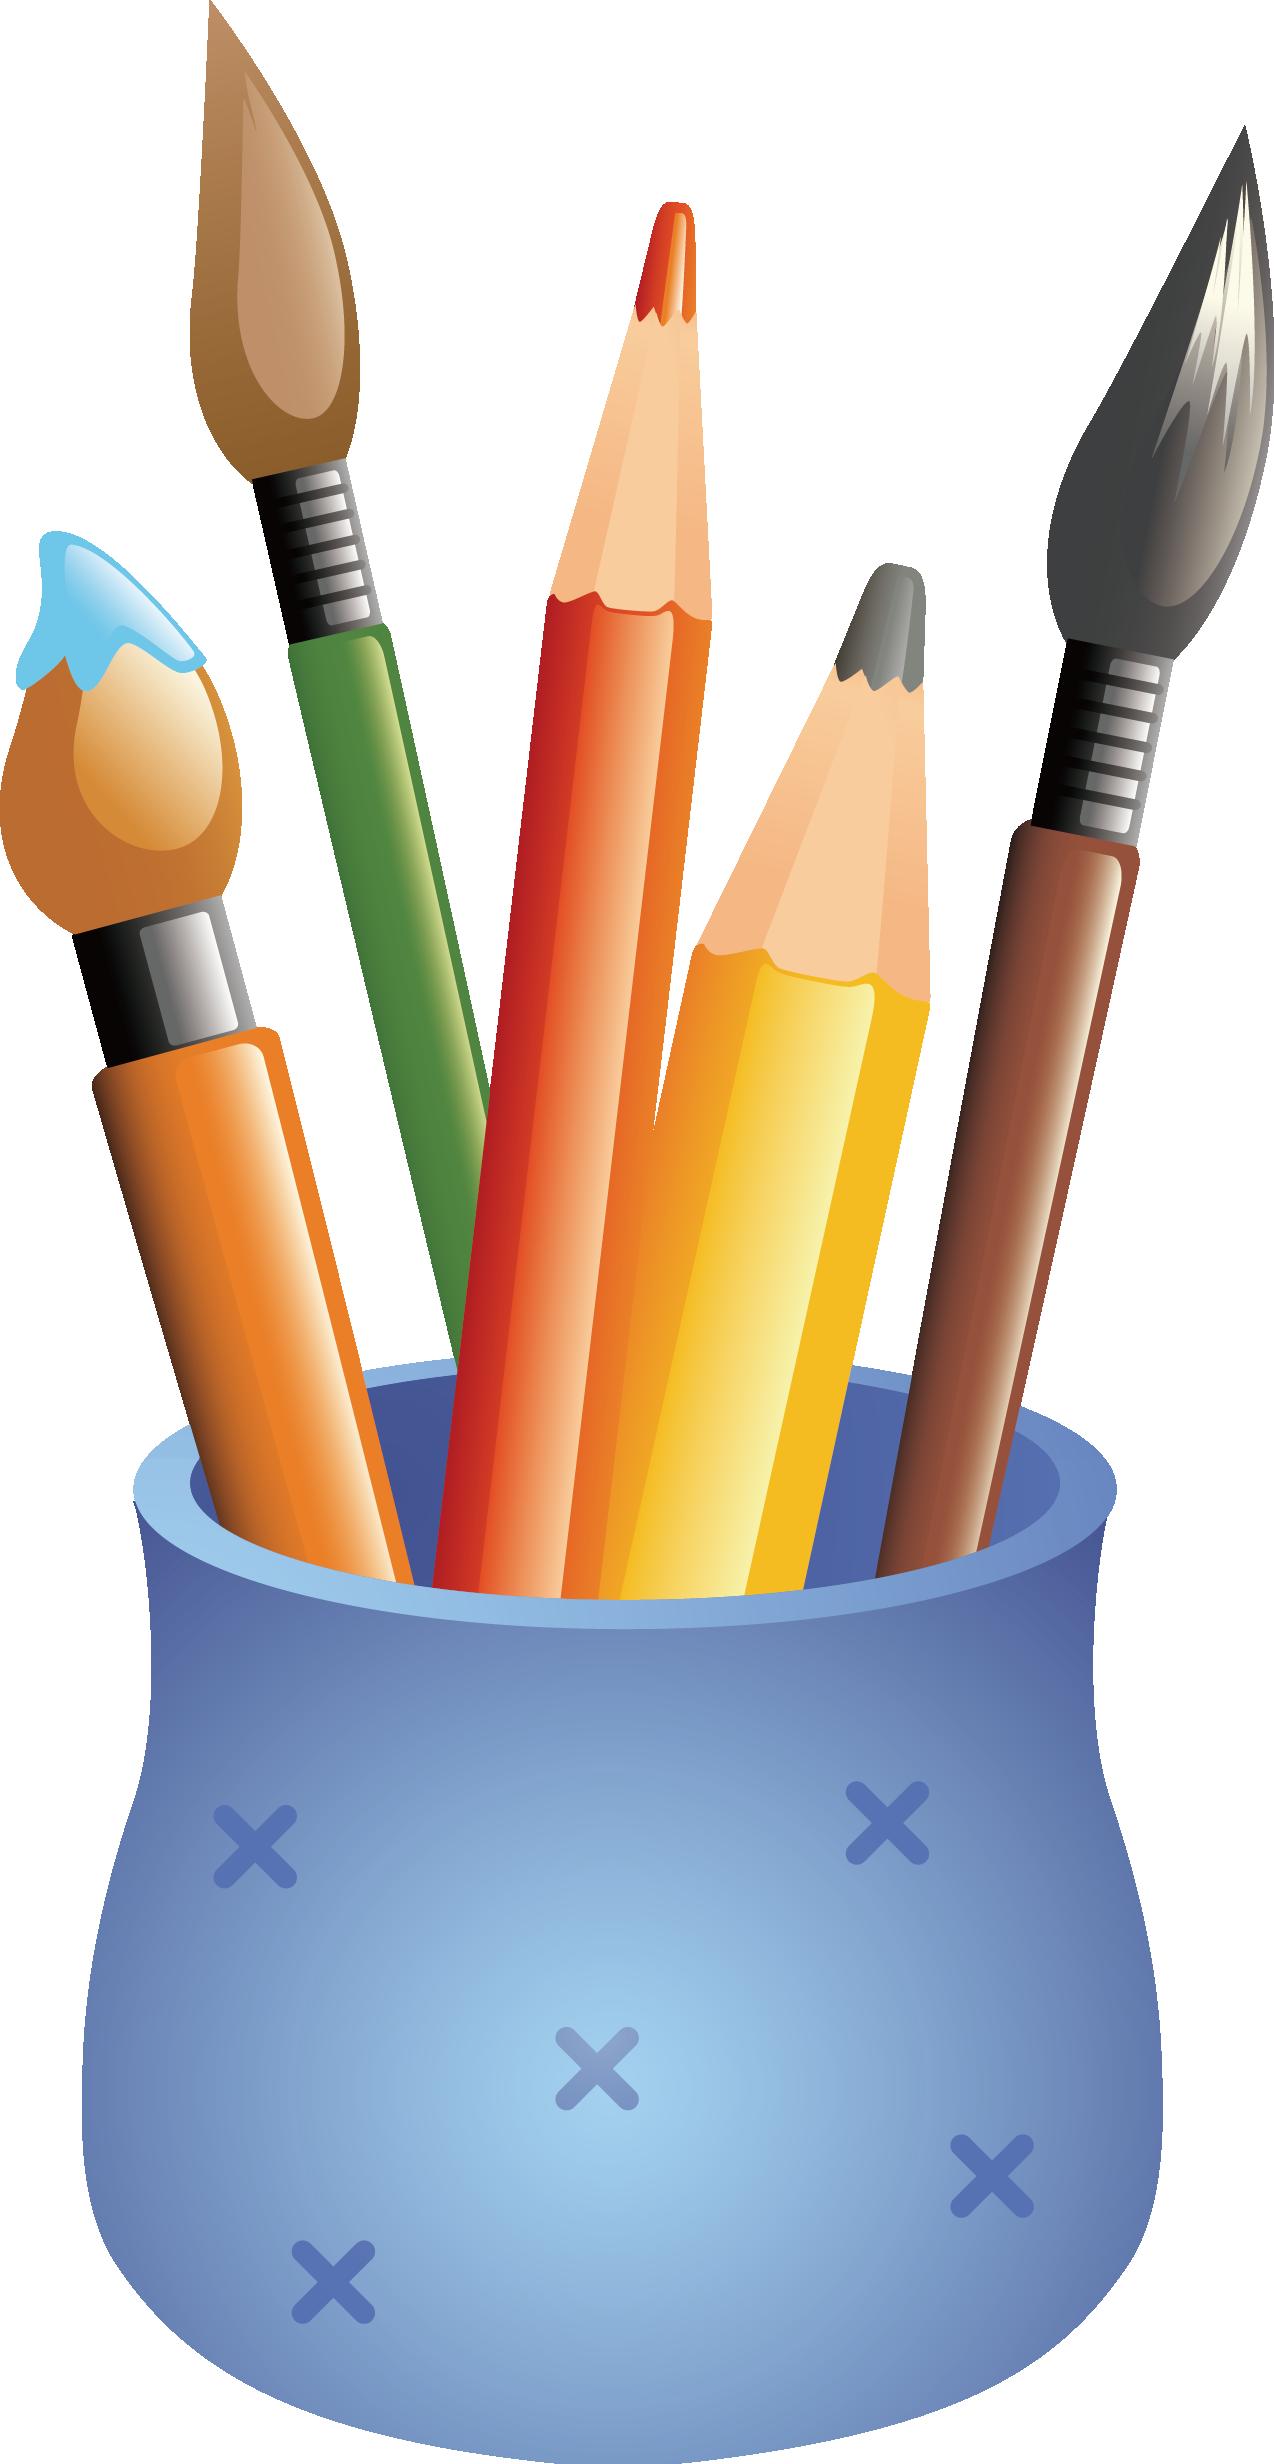 svg transparent stock Bananas drawing colored pencil. Case cartoon pen holder